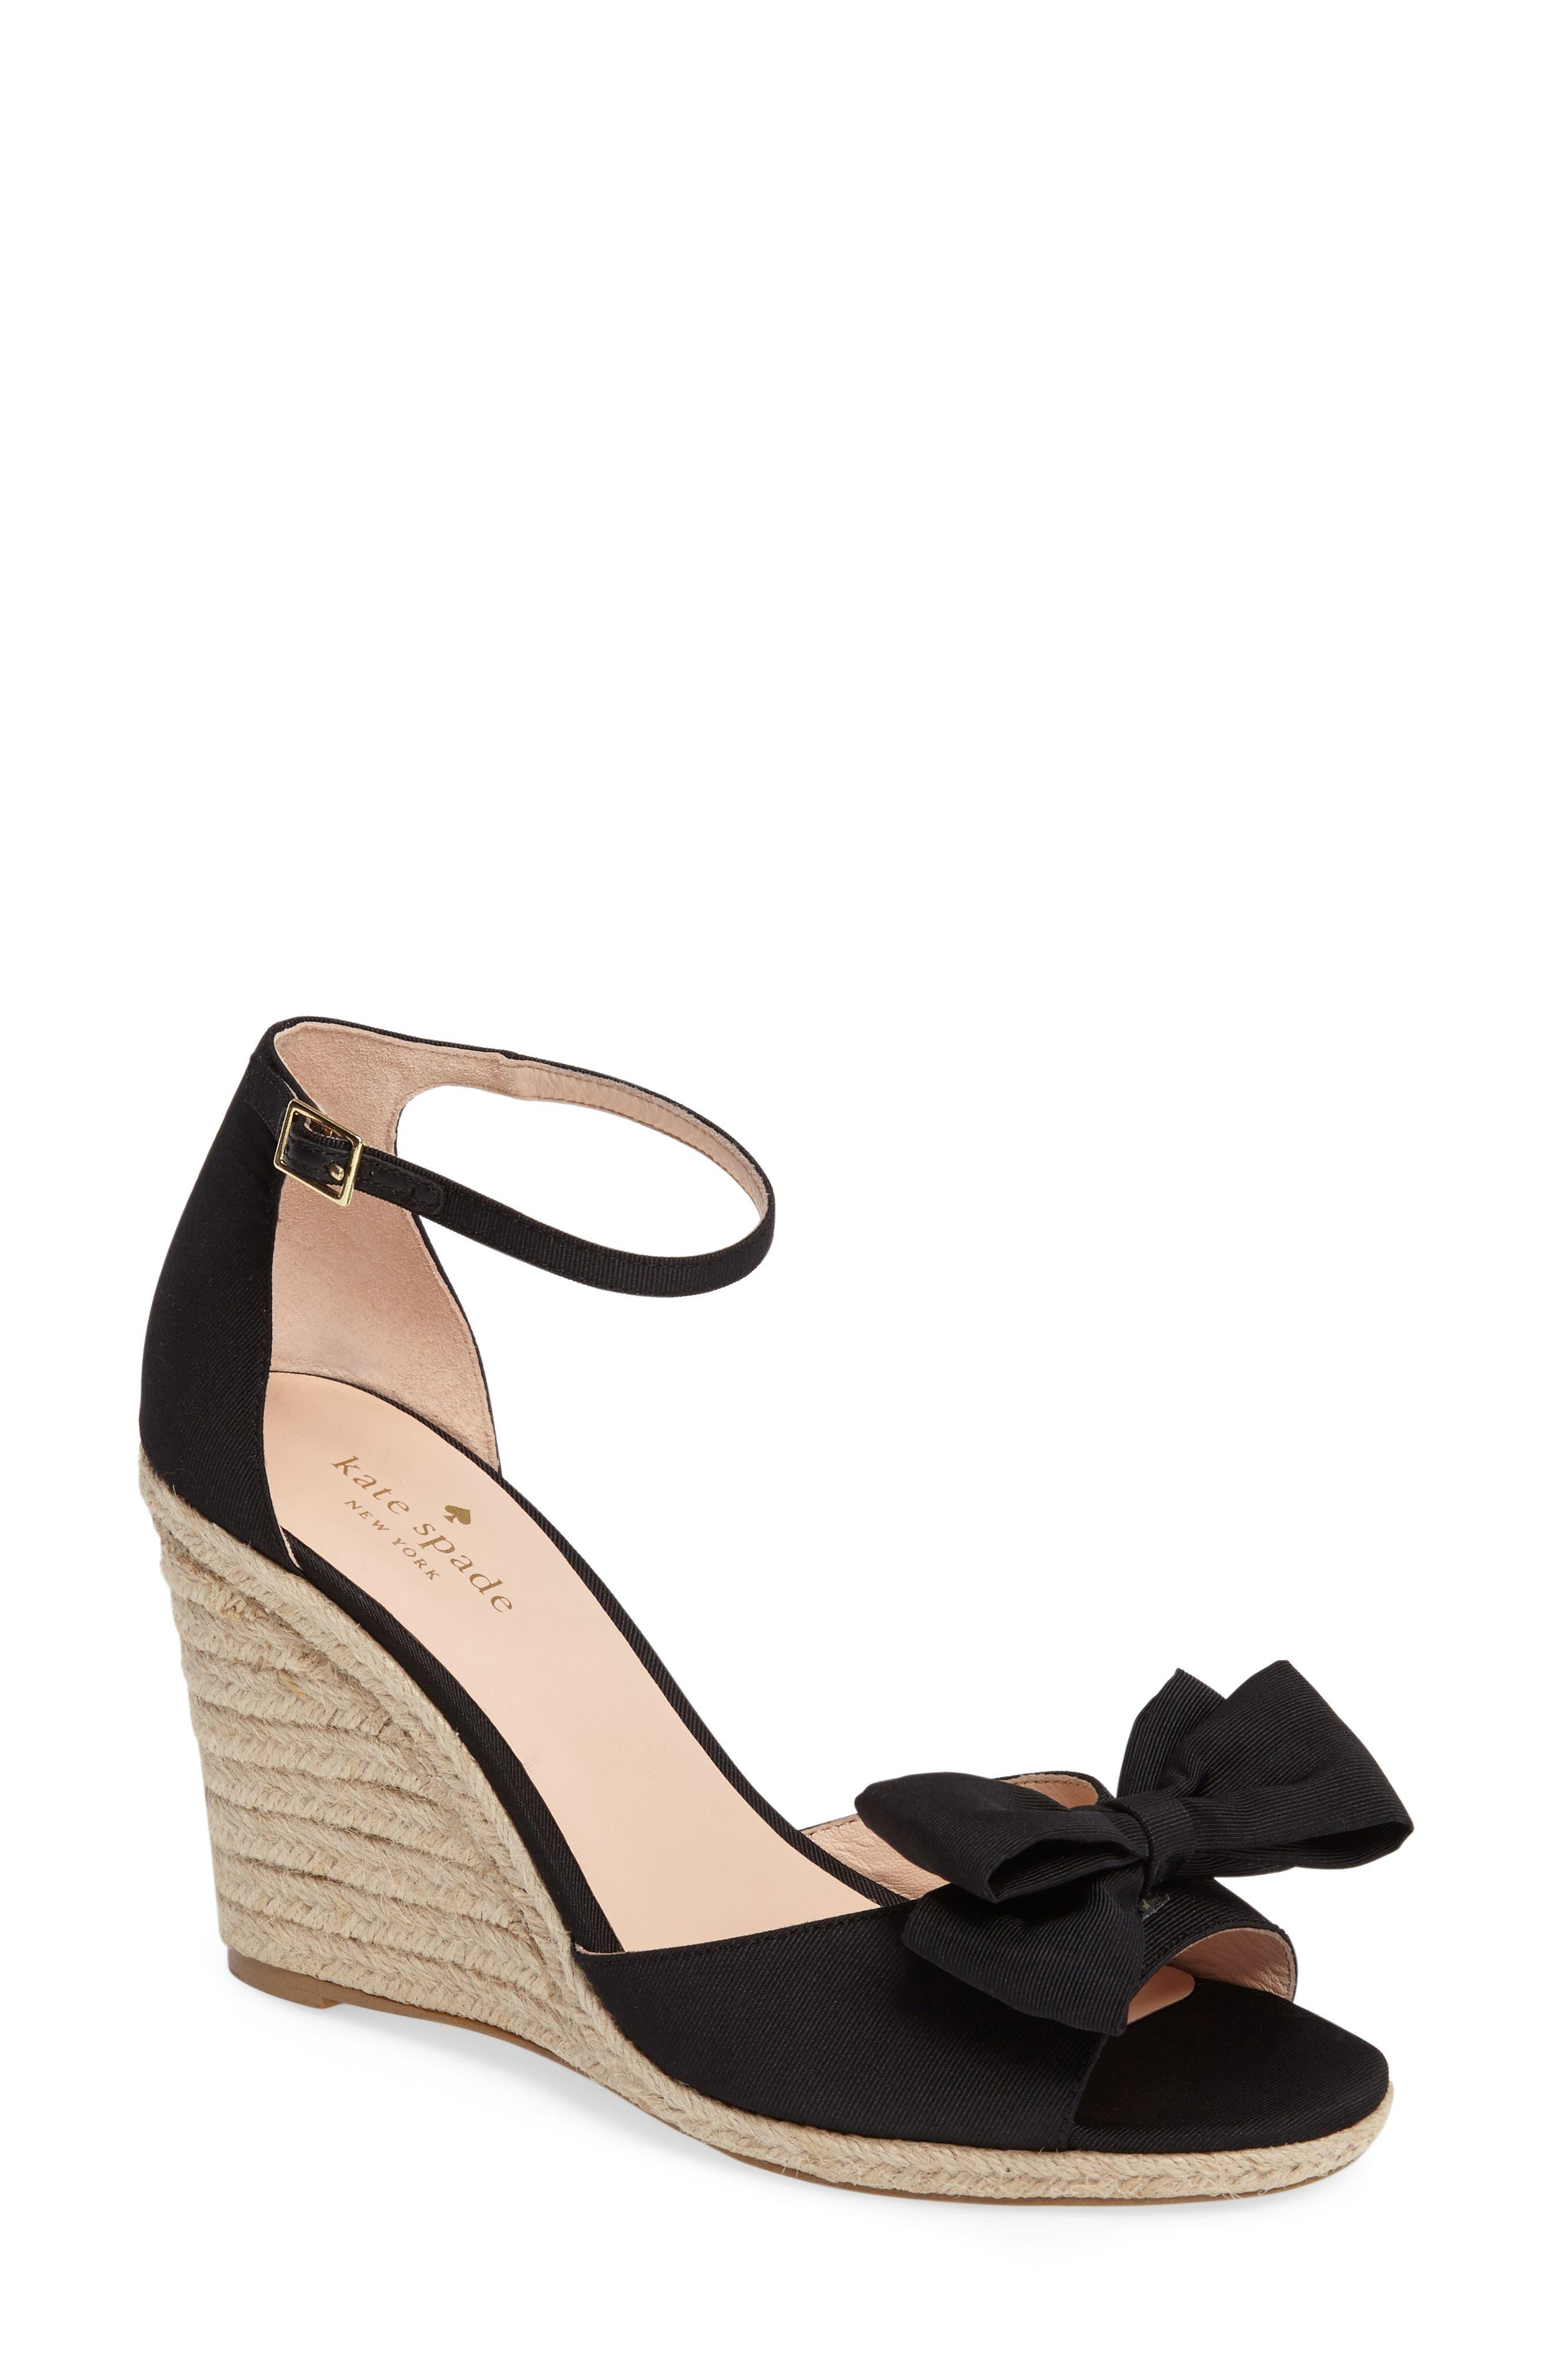 kate spade new york broome wedge sandal (Women)